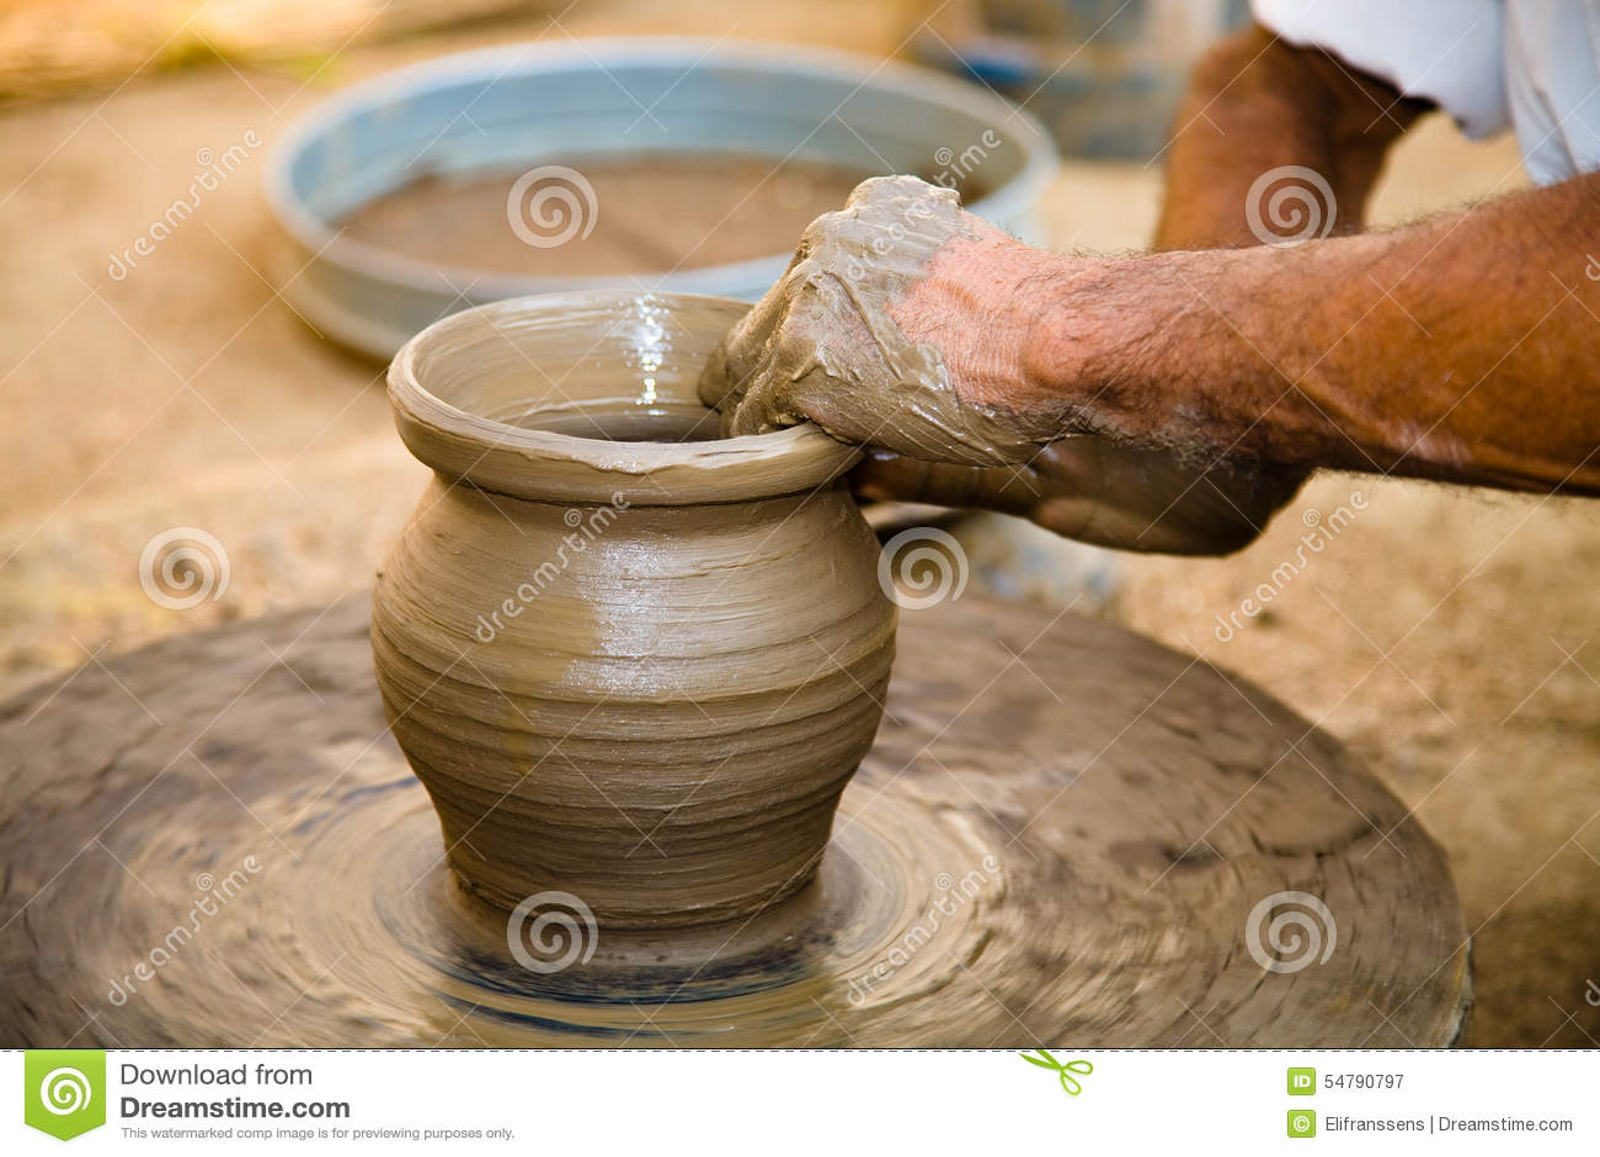 Pottery Rajasthan Indian Stock Image Image Of Craftsman